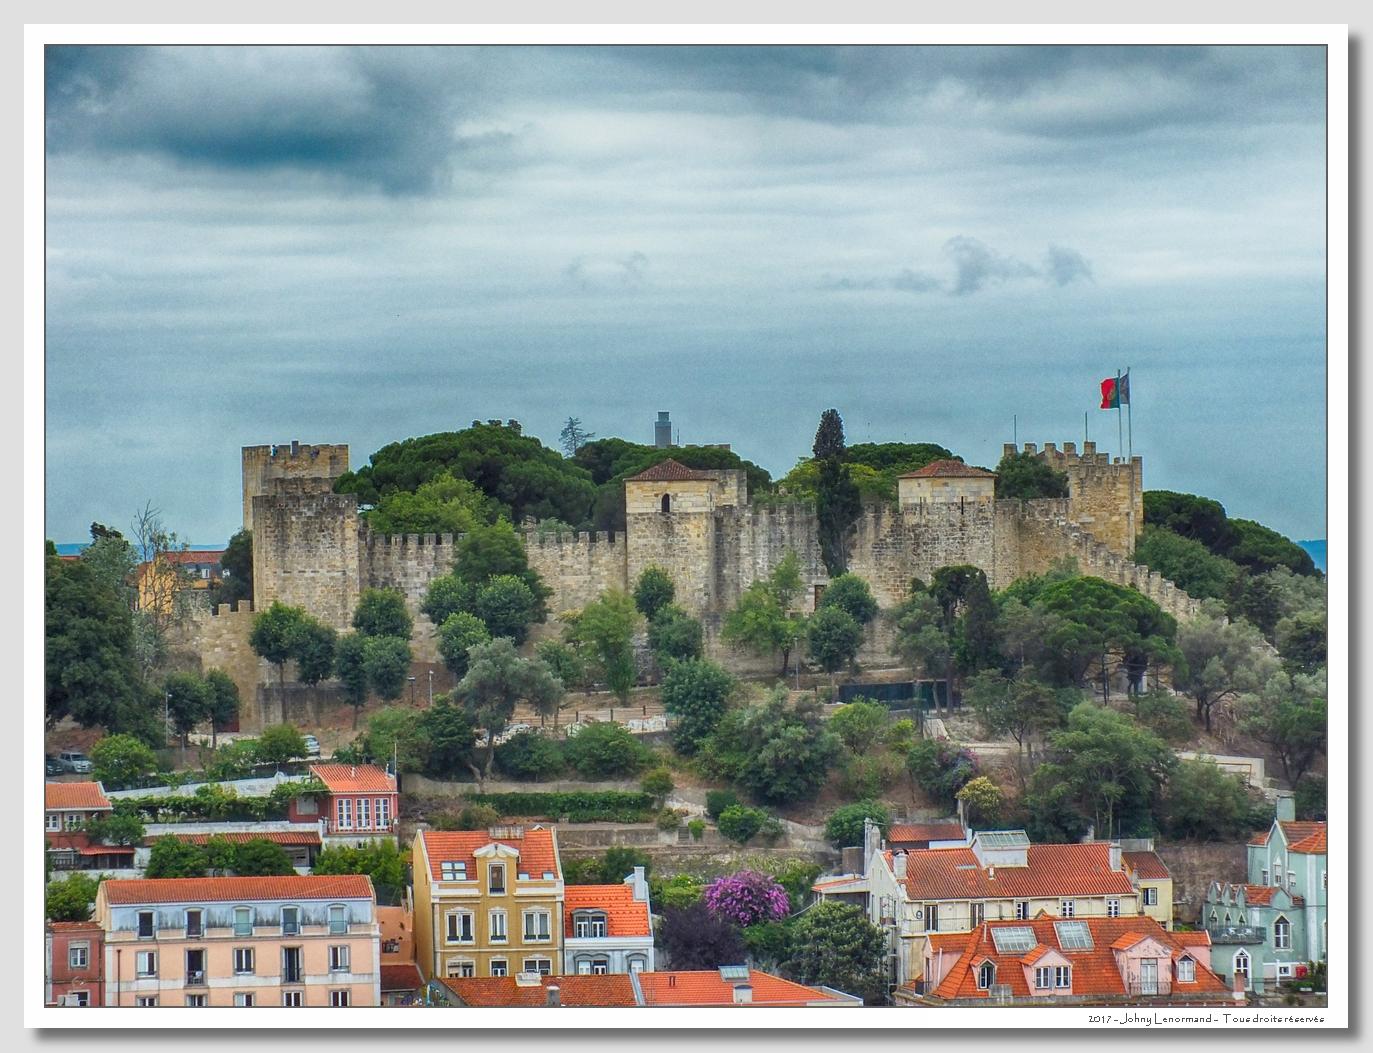 Voyage au Portugal: Lisbonne